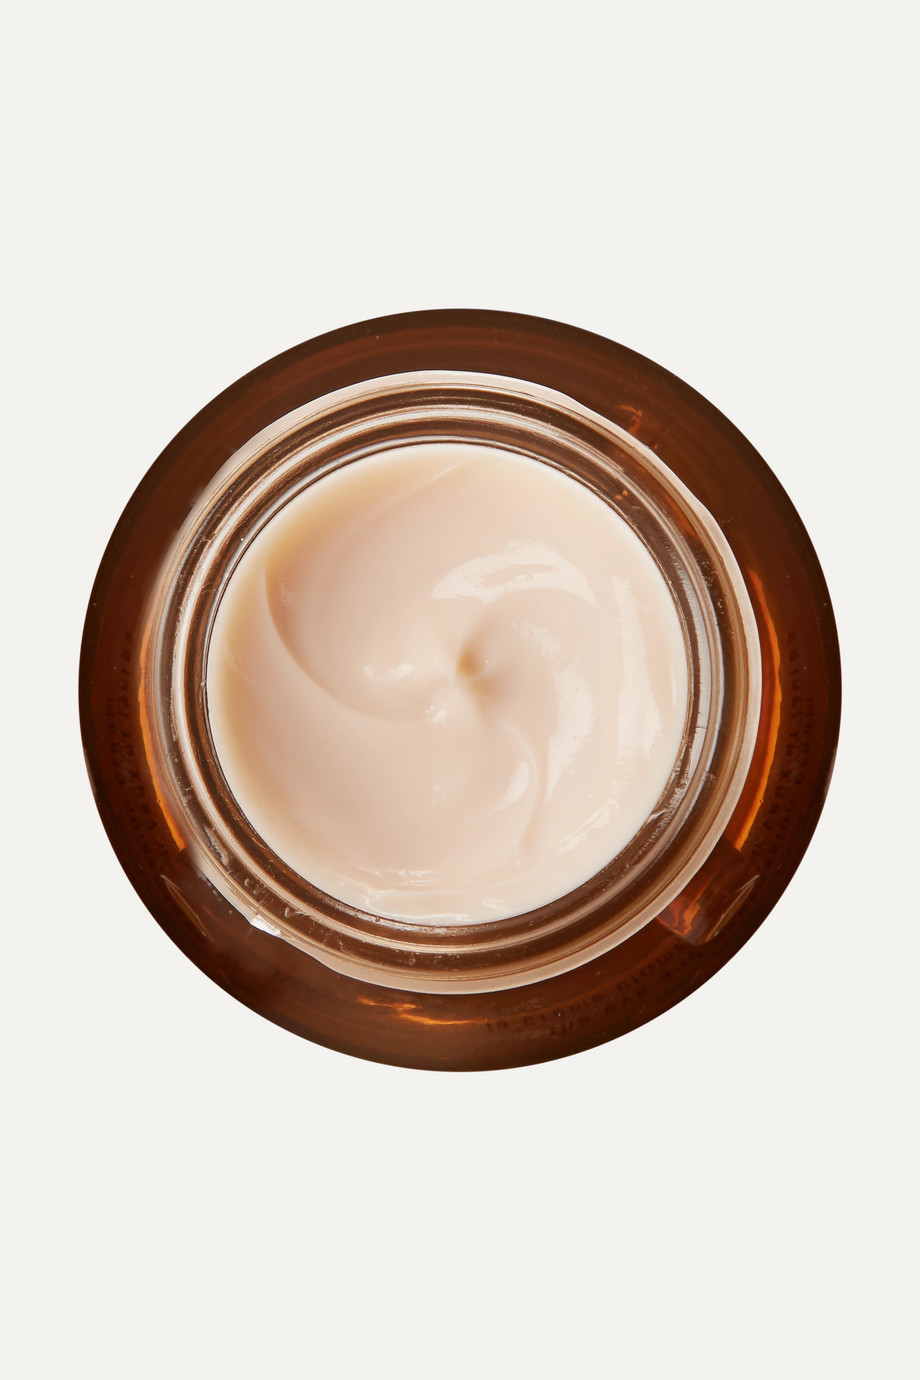 La Mer Genaissance de la Mer Eye & Expression Cream, 15ml